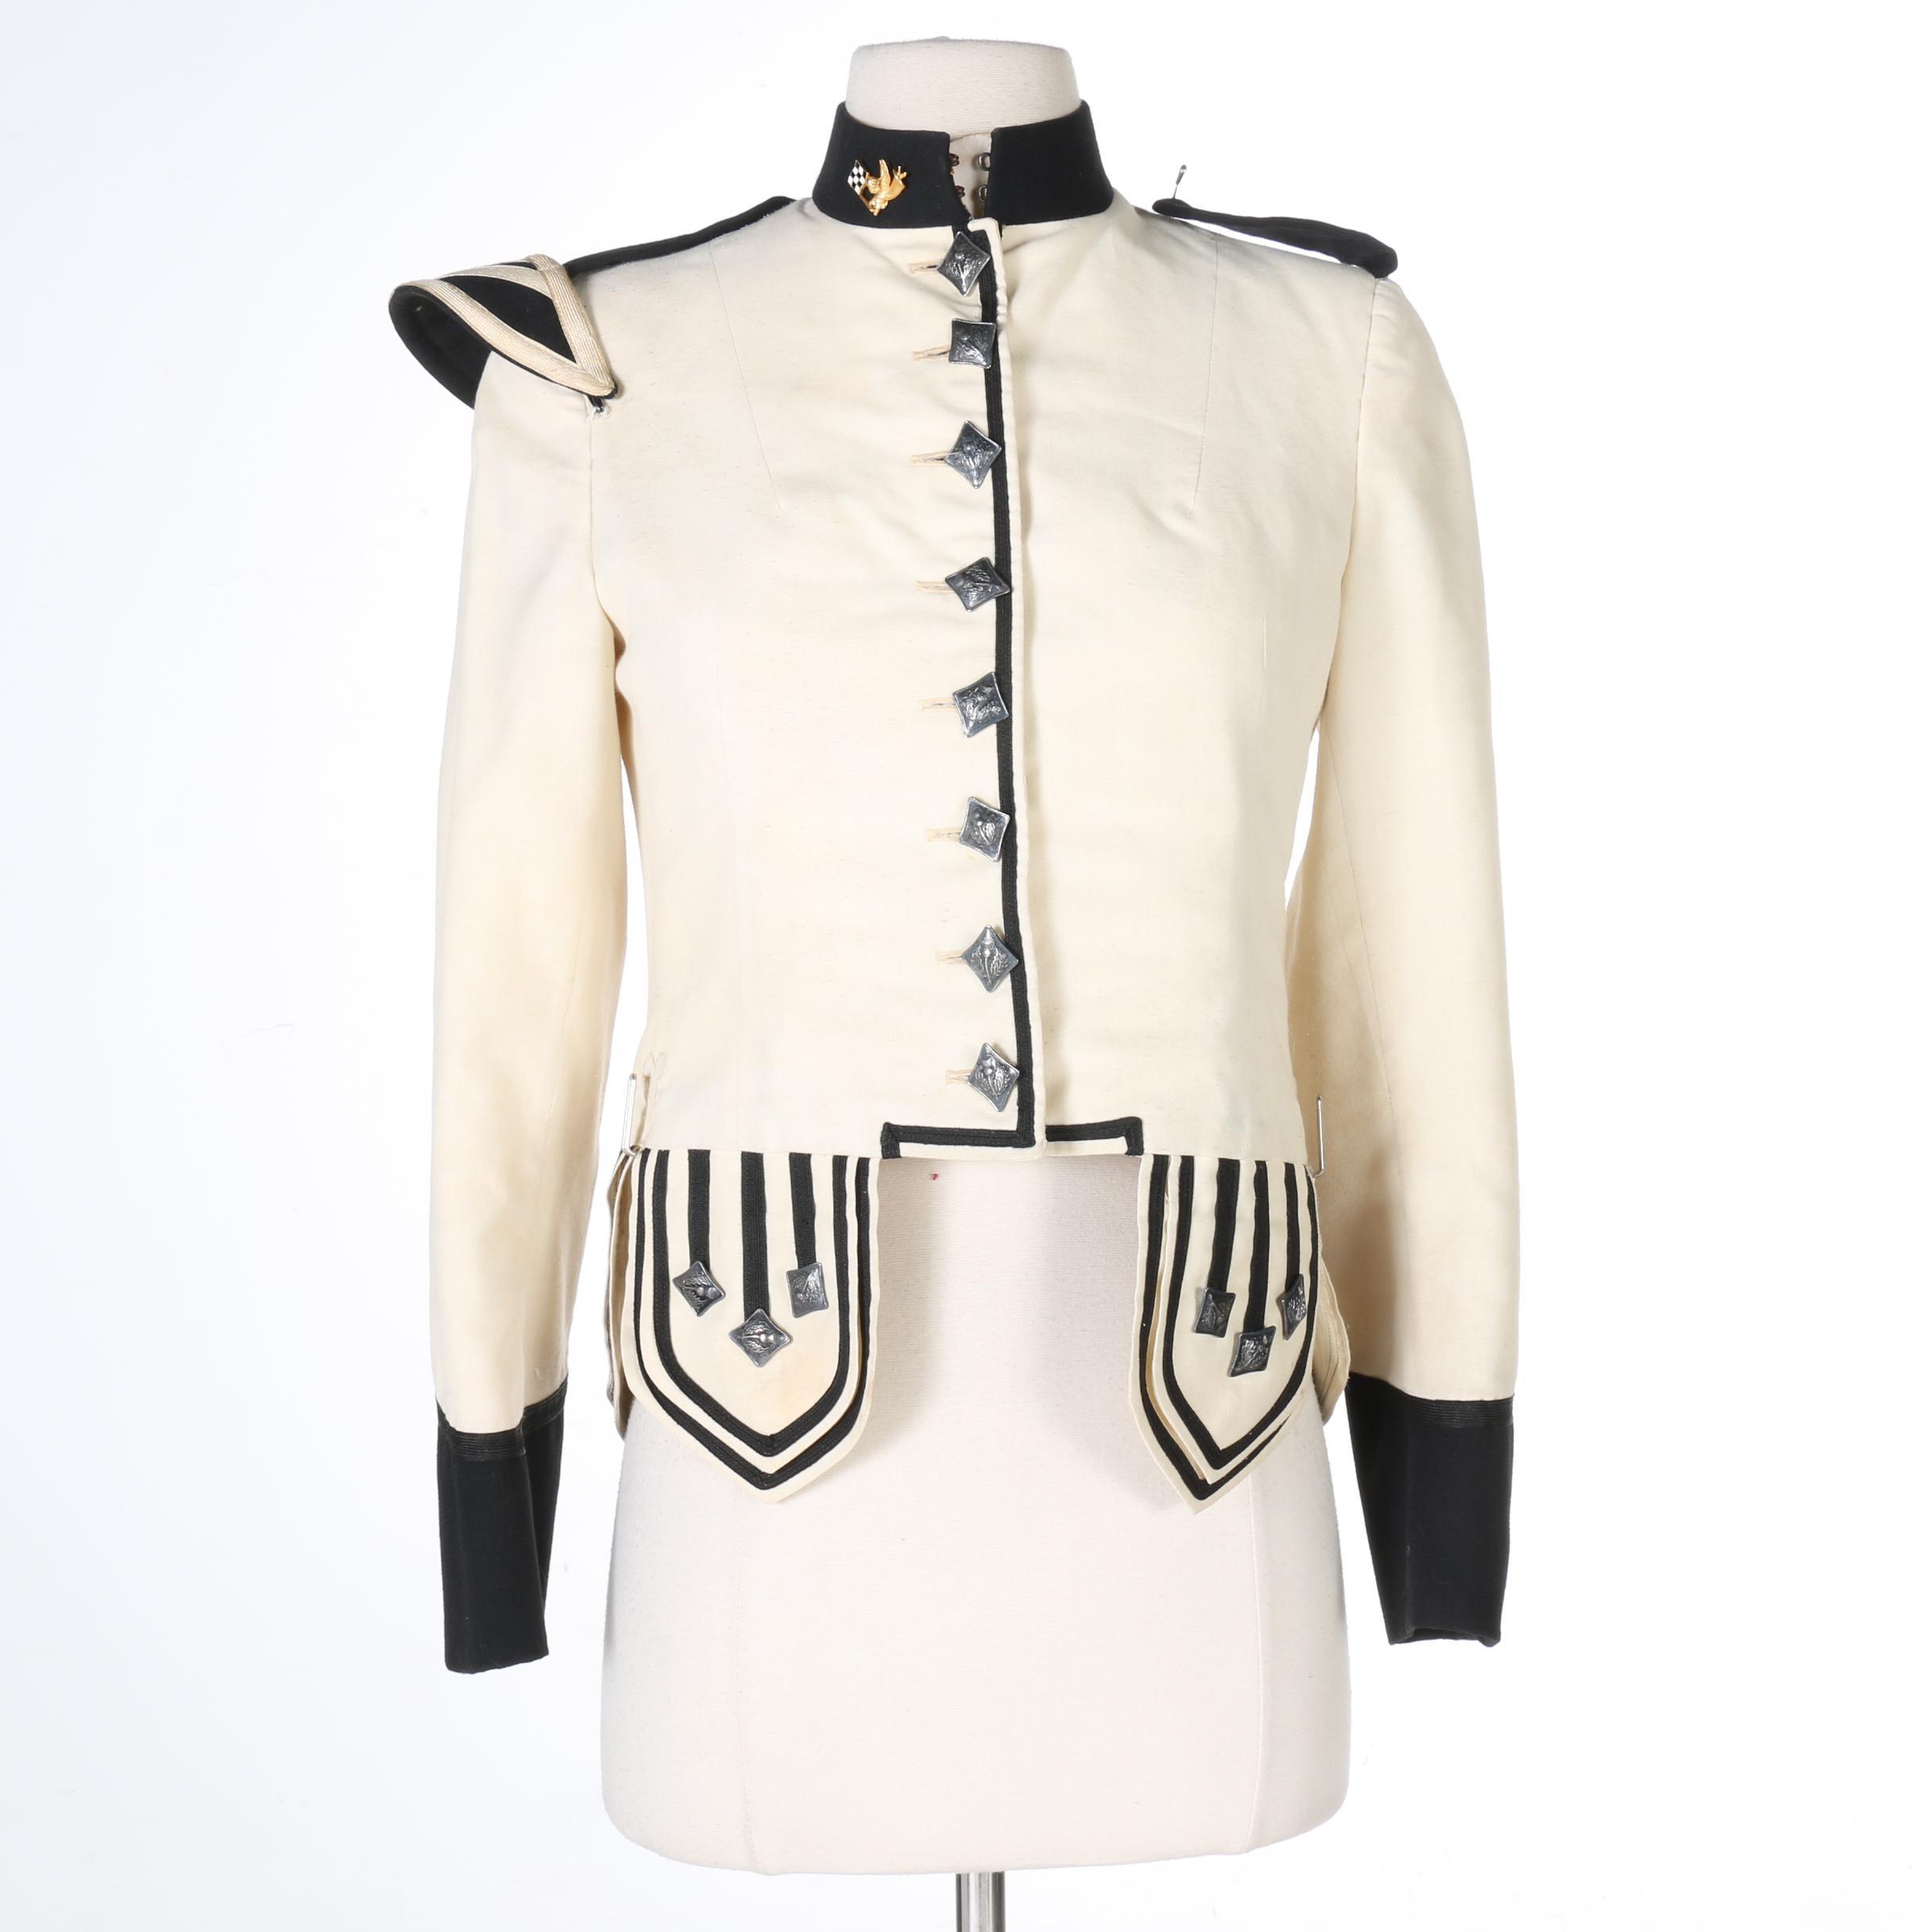 Ascot Clothes Vintage Band Jacket